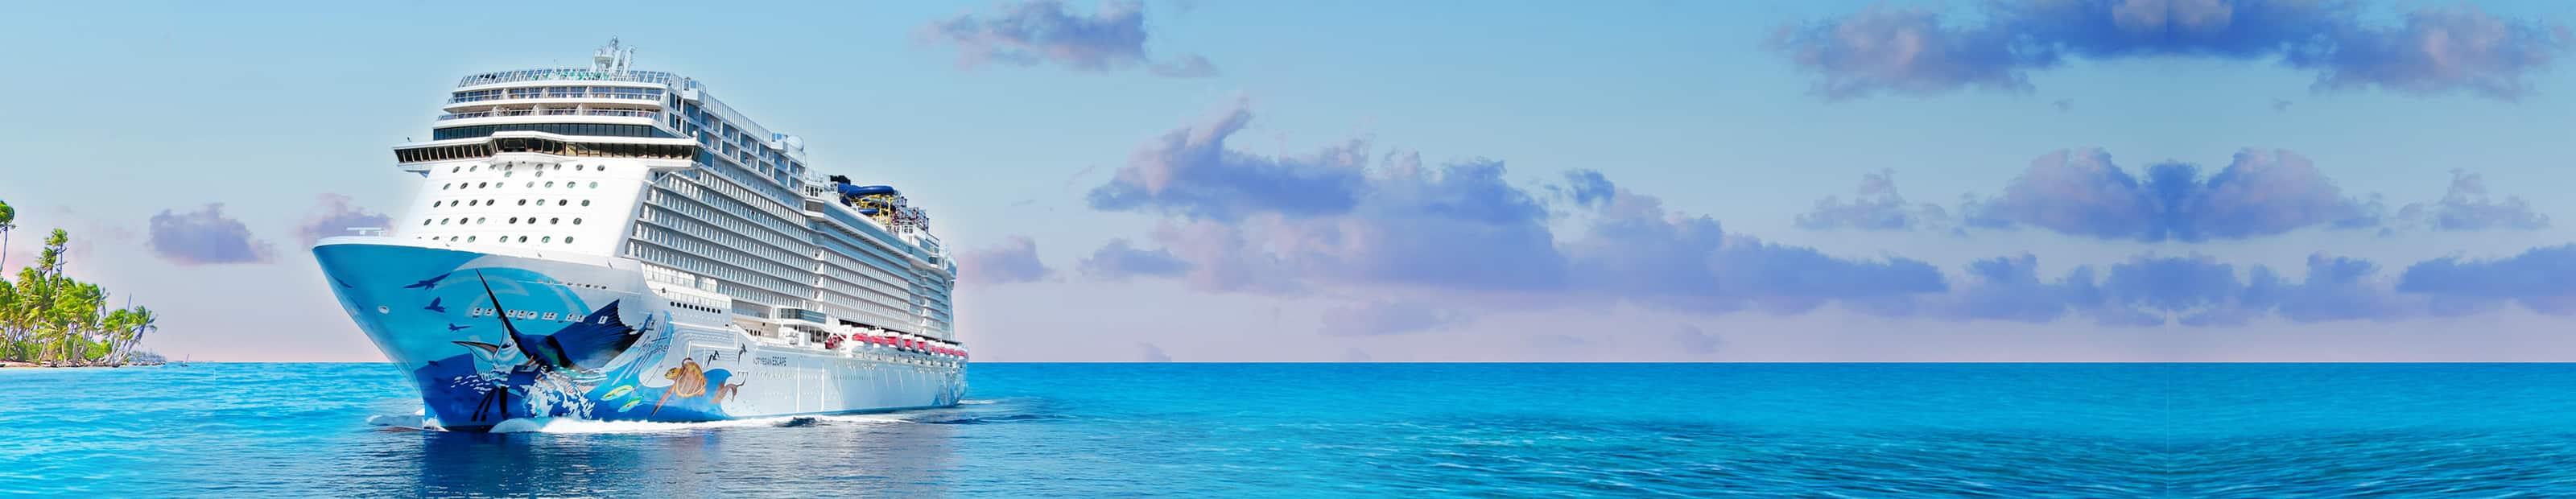 Freeat Sea deNorwegian+ crédito para gastar a bordo| Cruceros y ofertas de crucero